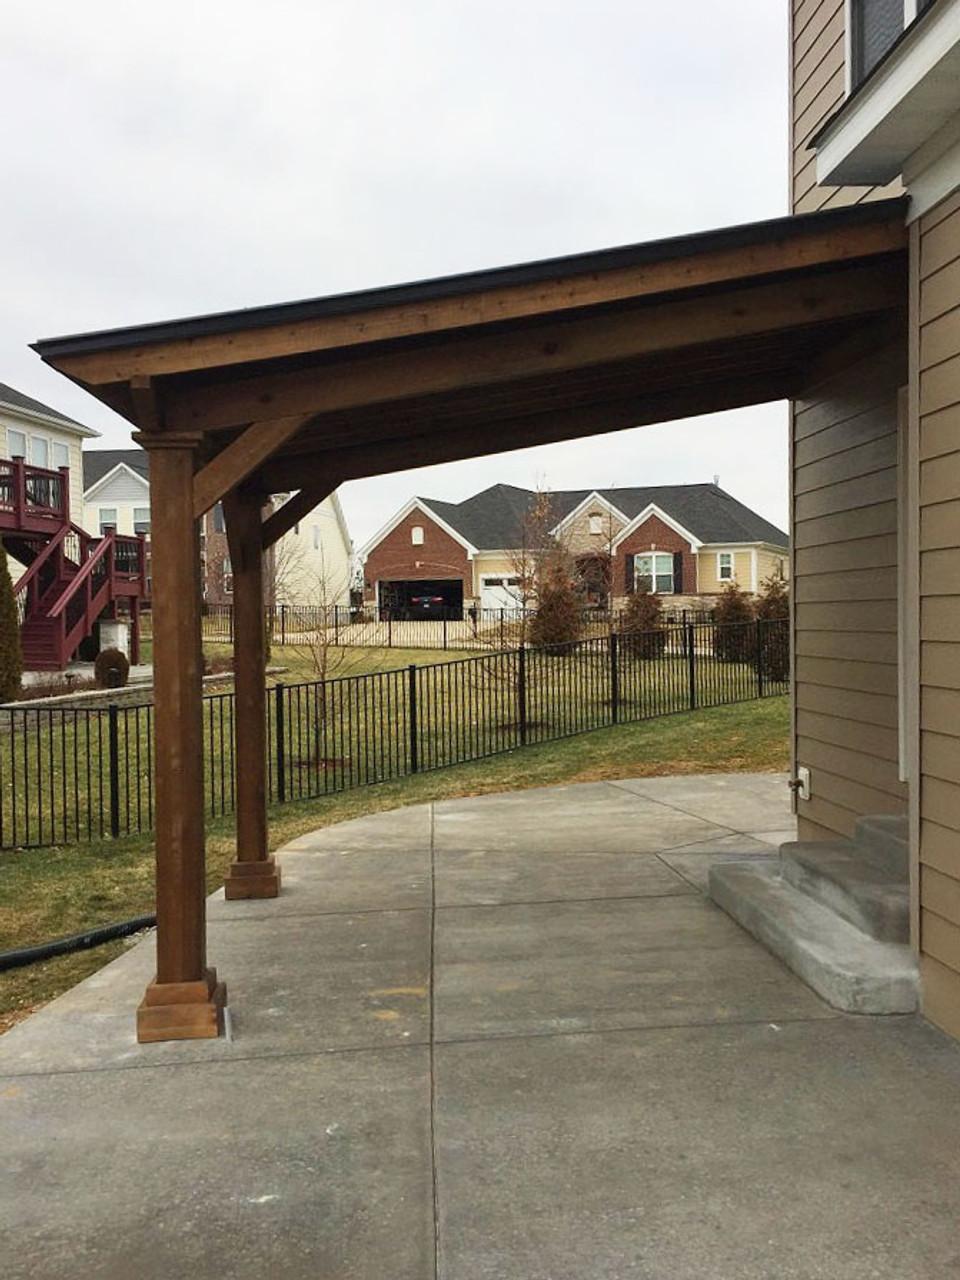 12x9 Wall-mounted Western Cedar Pavilion Chesterfield Missouri